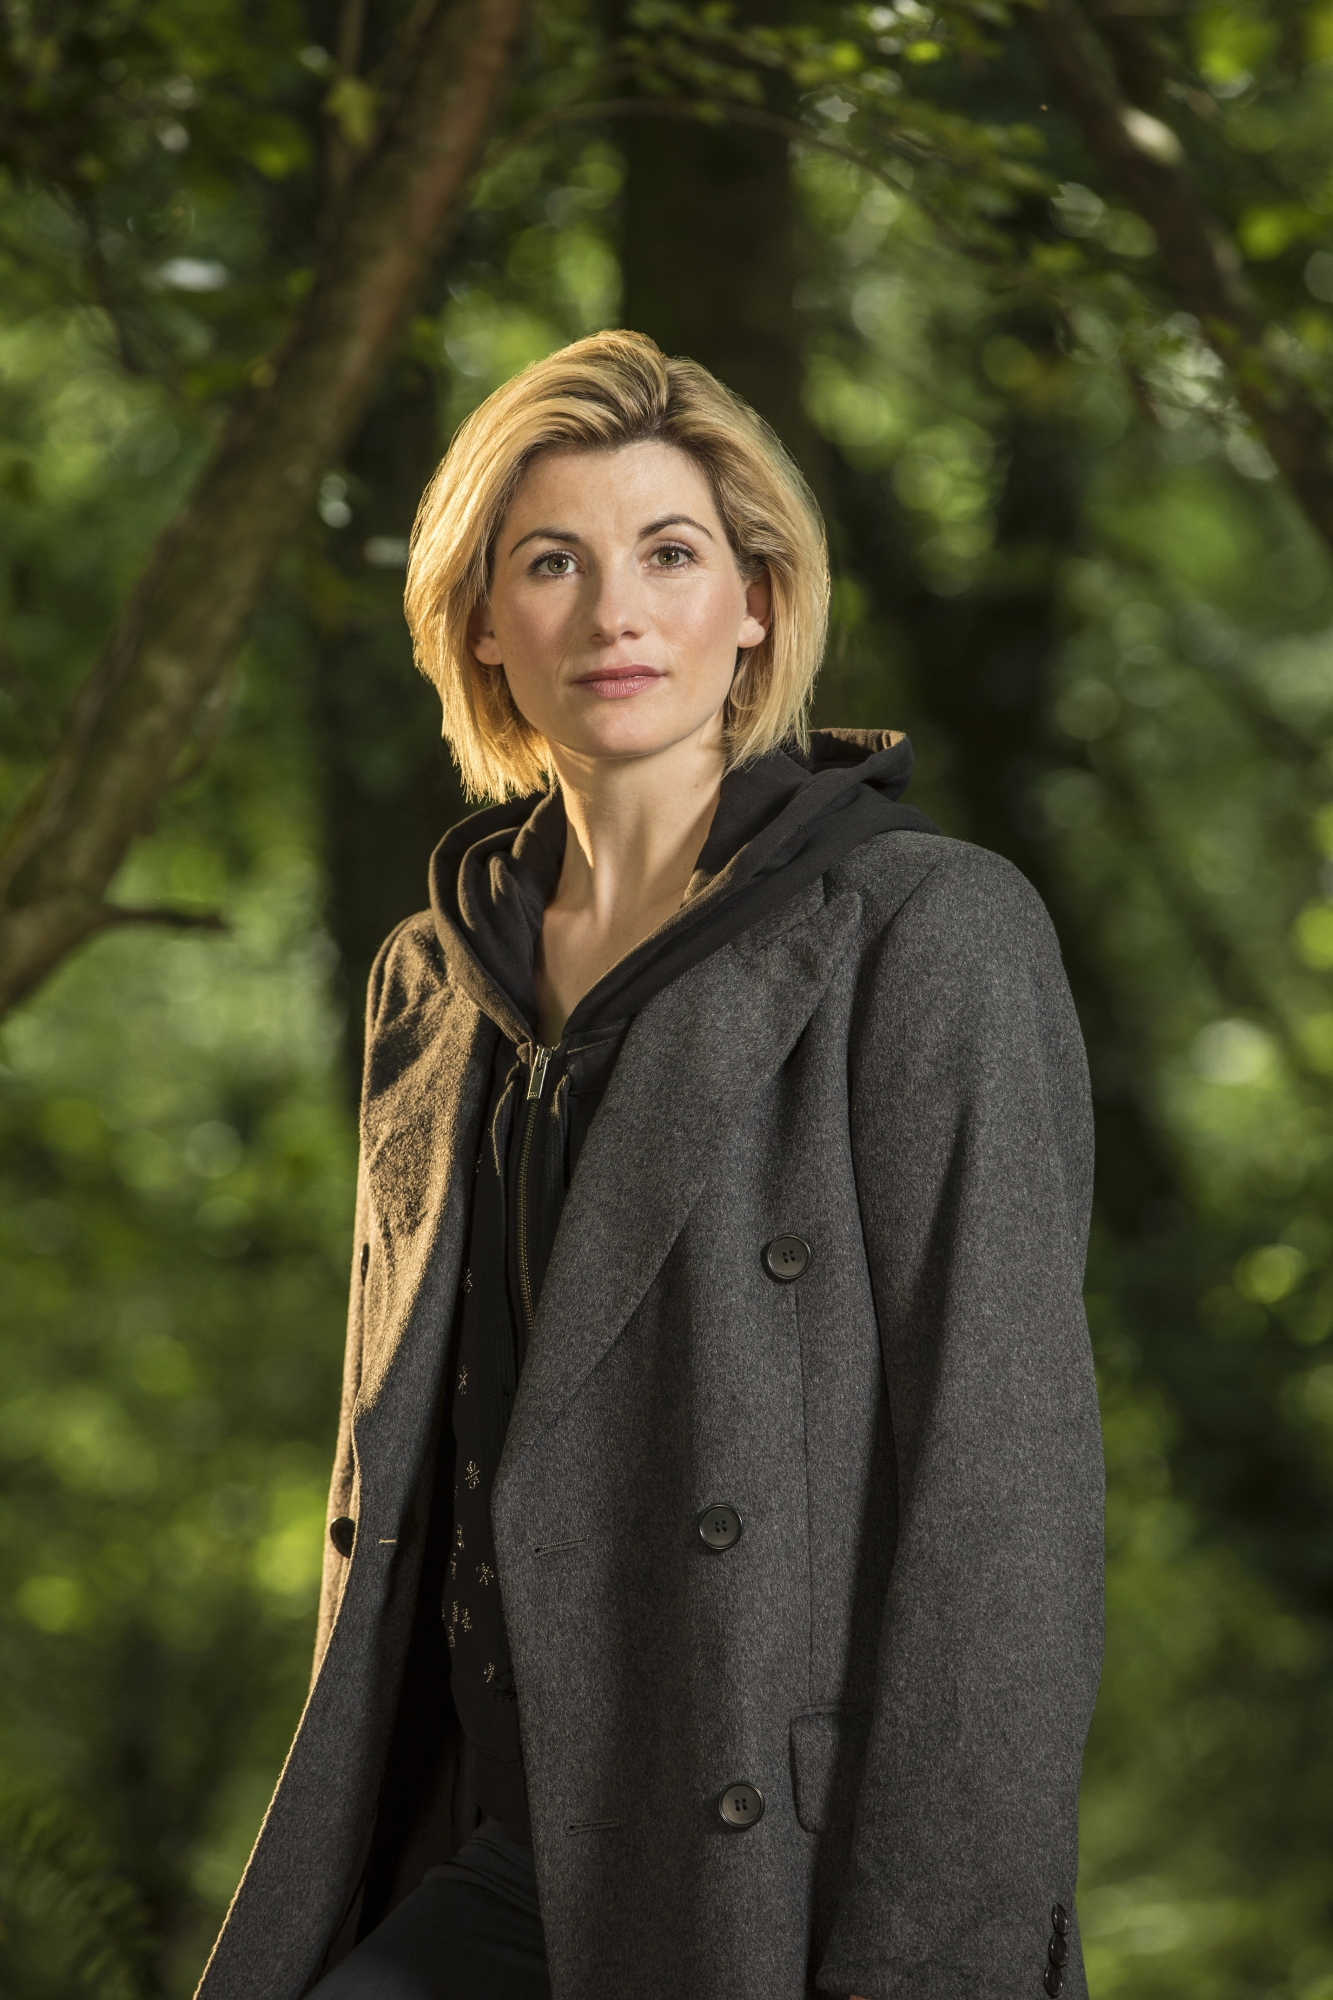 Jodie Whittaker - Image Credit: BBC/Colin Hutton